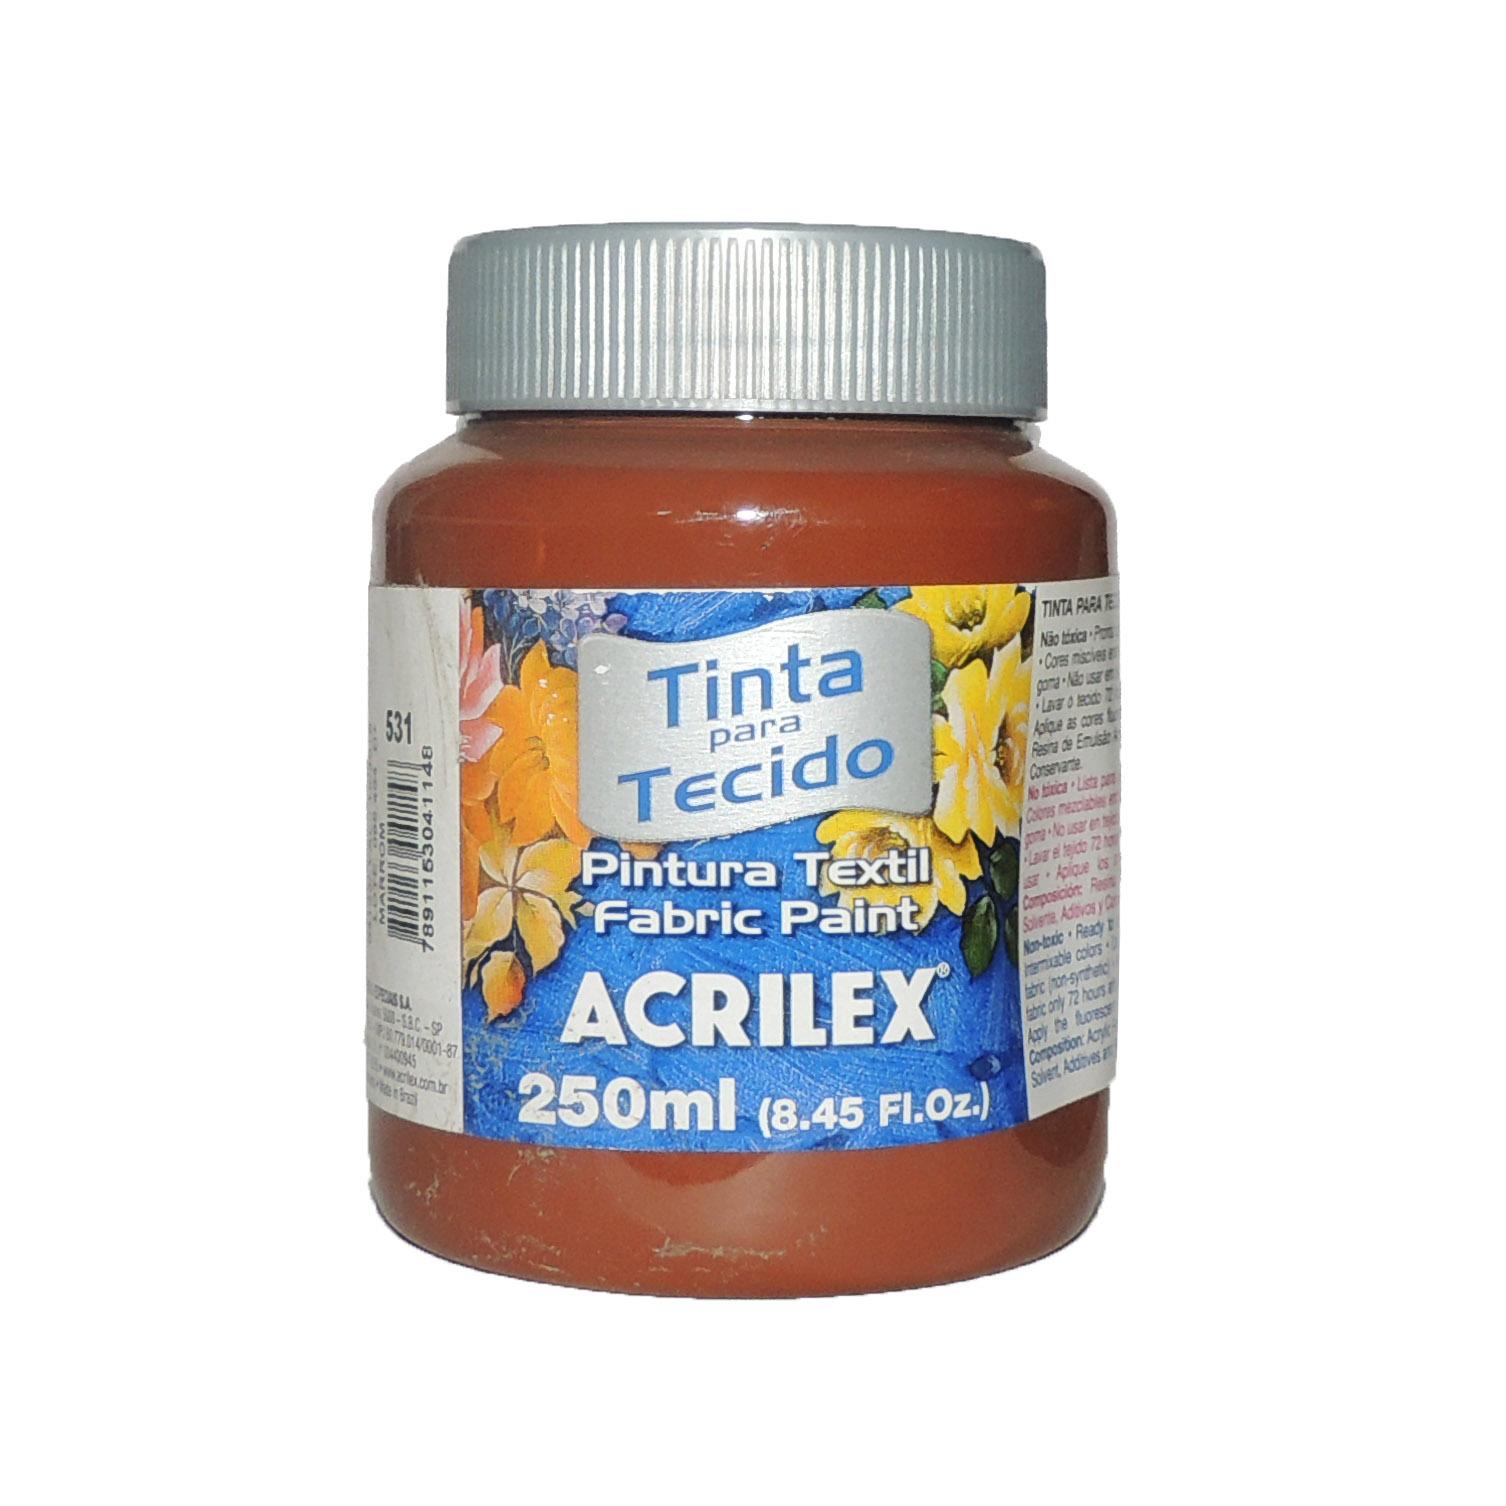 tinta-para-tecido-acrilex-250ml-531-marrom